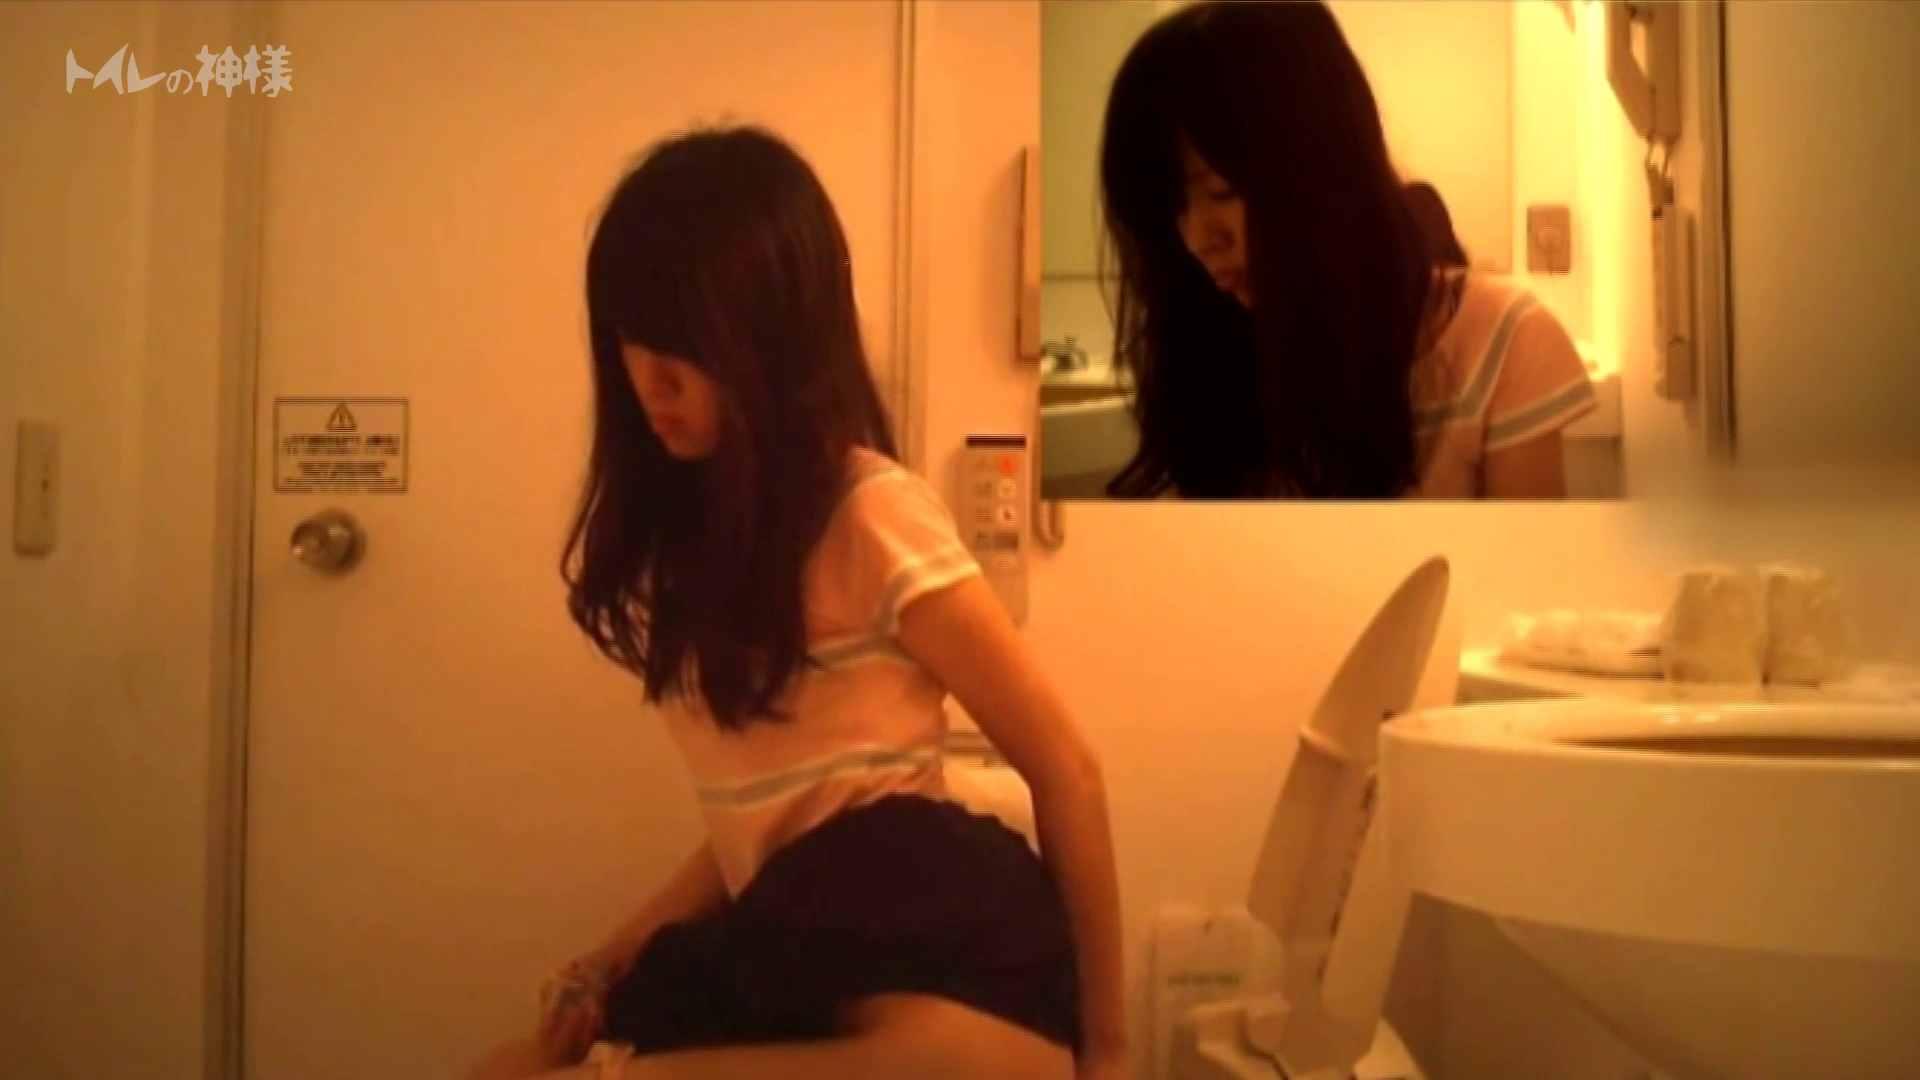 Vol.04 女子大生のトイレ恥態 女子大生 オマンコ動画キャプチャ 89画像 47